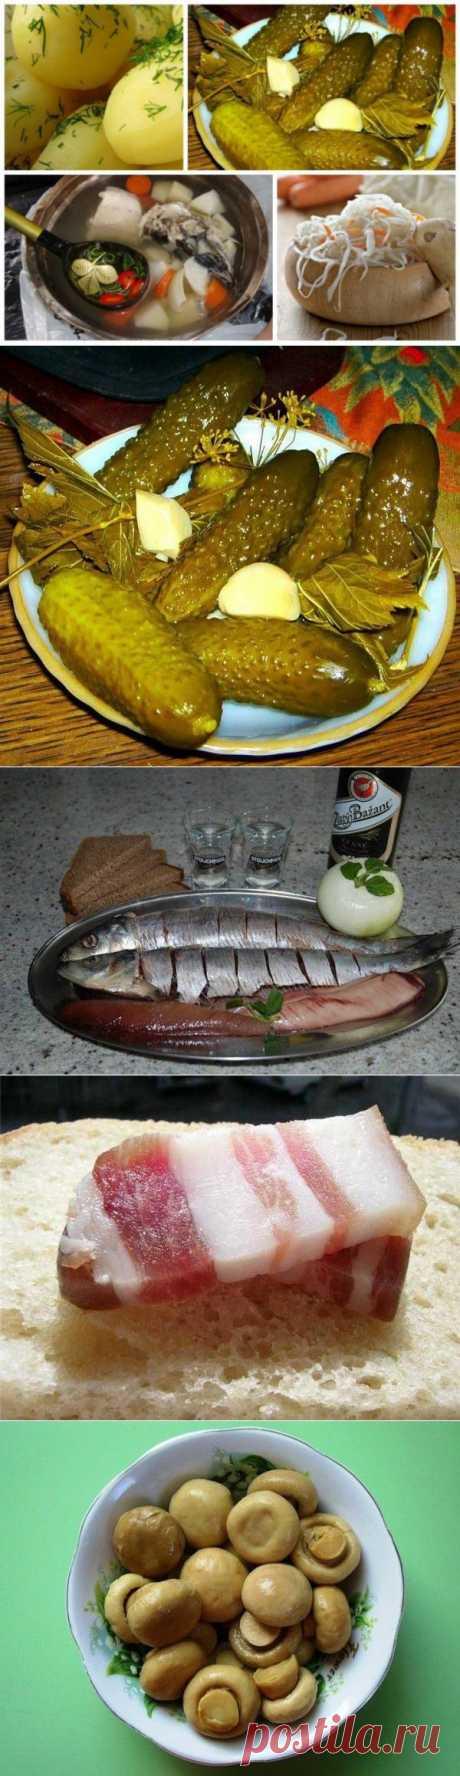 Закуска по-русски